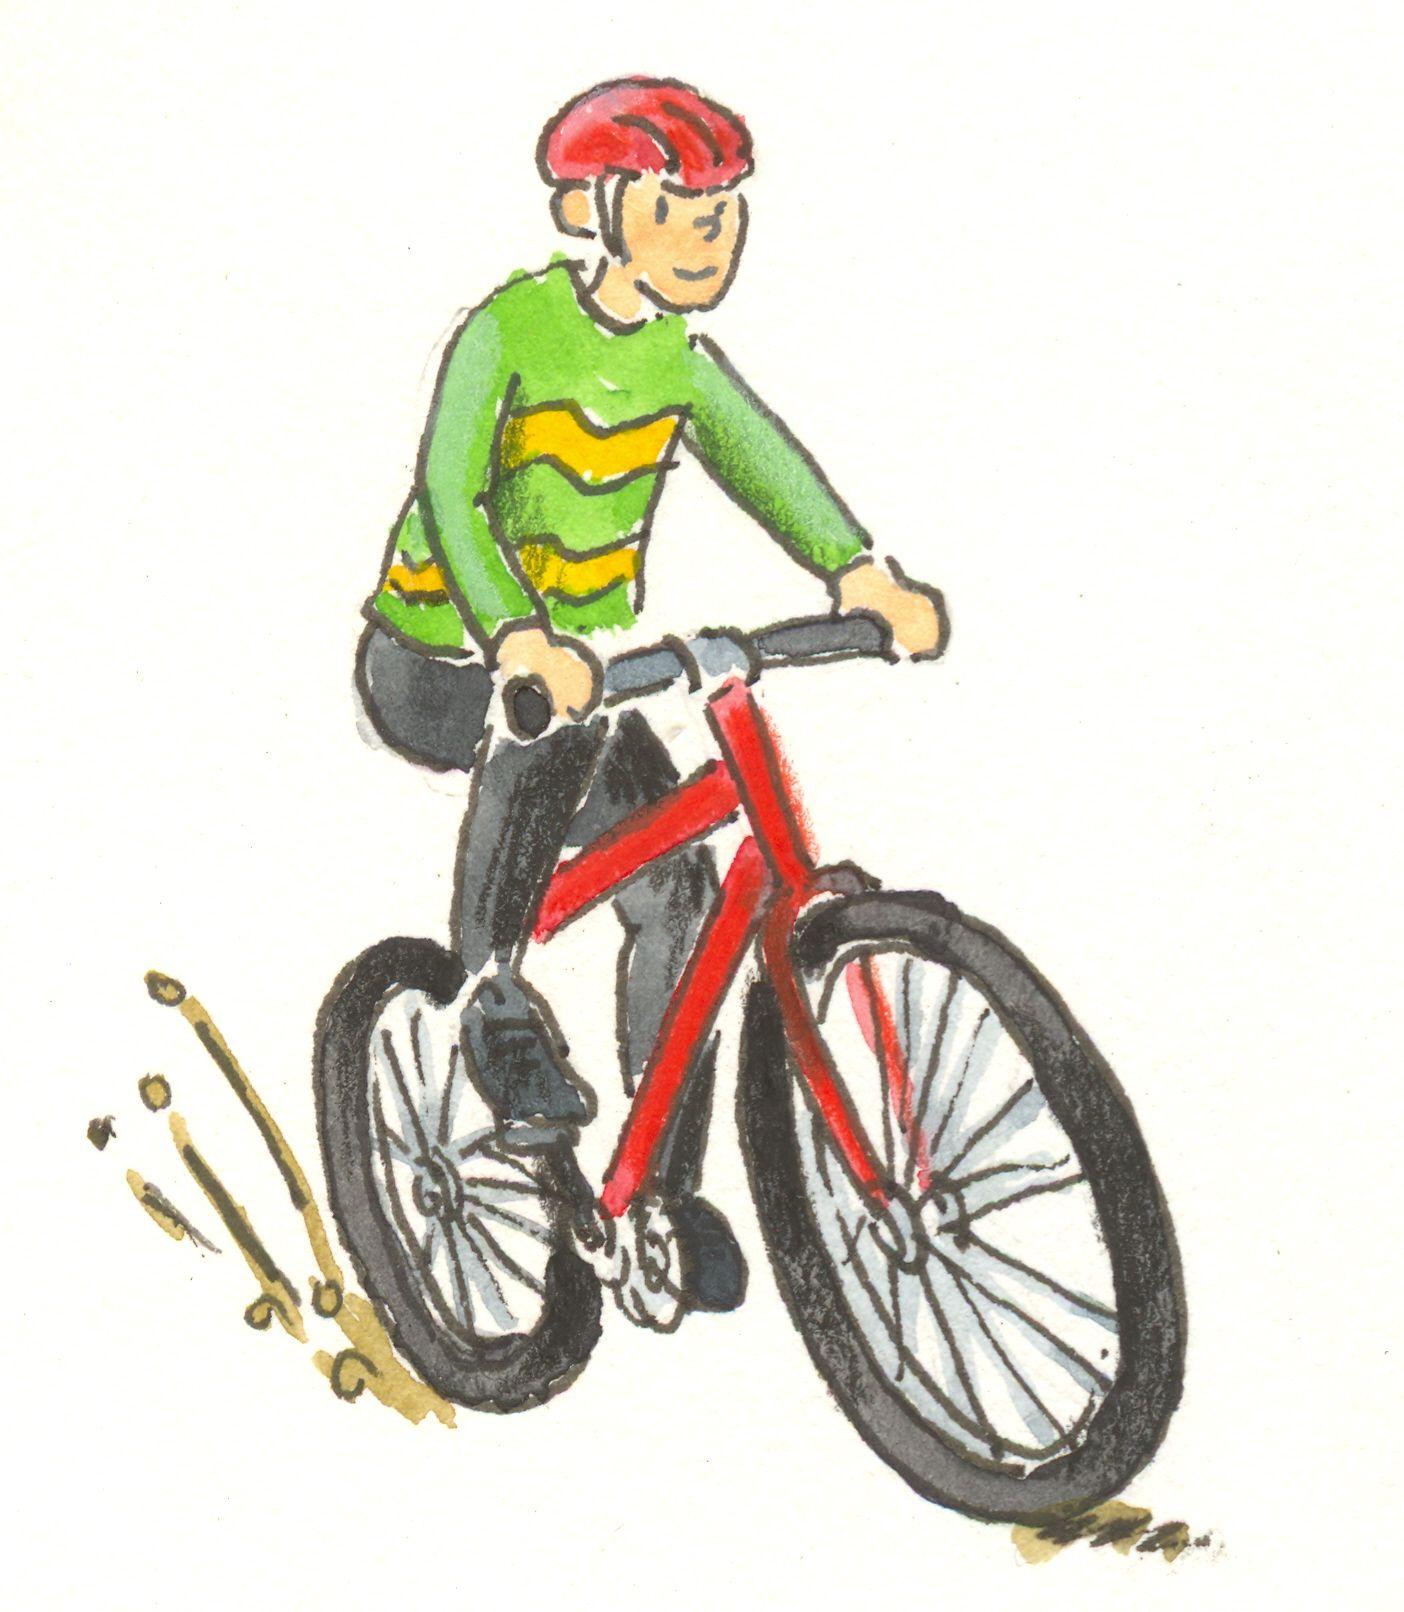 Kind auf fahrrad clipart png freeuse Fahrradfahren clipart - ClipartFest png freeuse